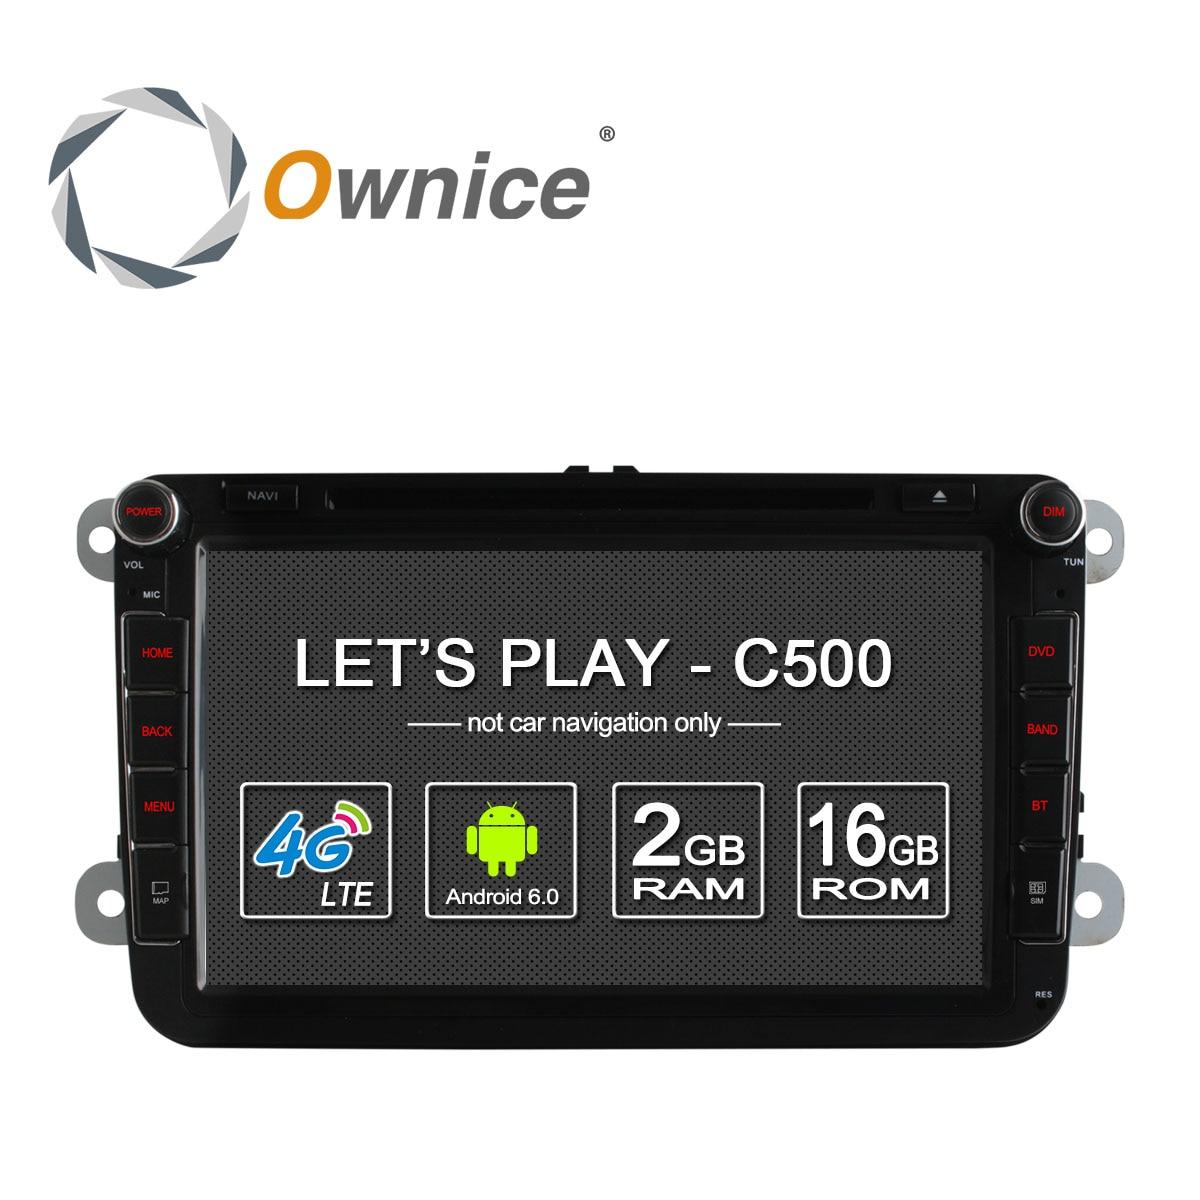 4G SIM LTE Nerwork Ownice C500 1024*600 Android 6.0 2G RAM 2 Din Car DVD GPS Navi Radio Player For VW Skoda Octavia 2